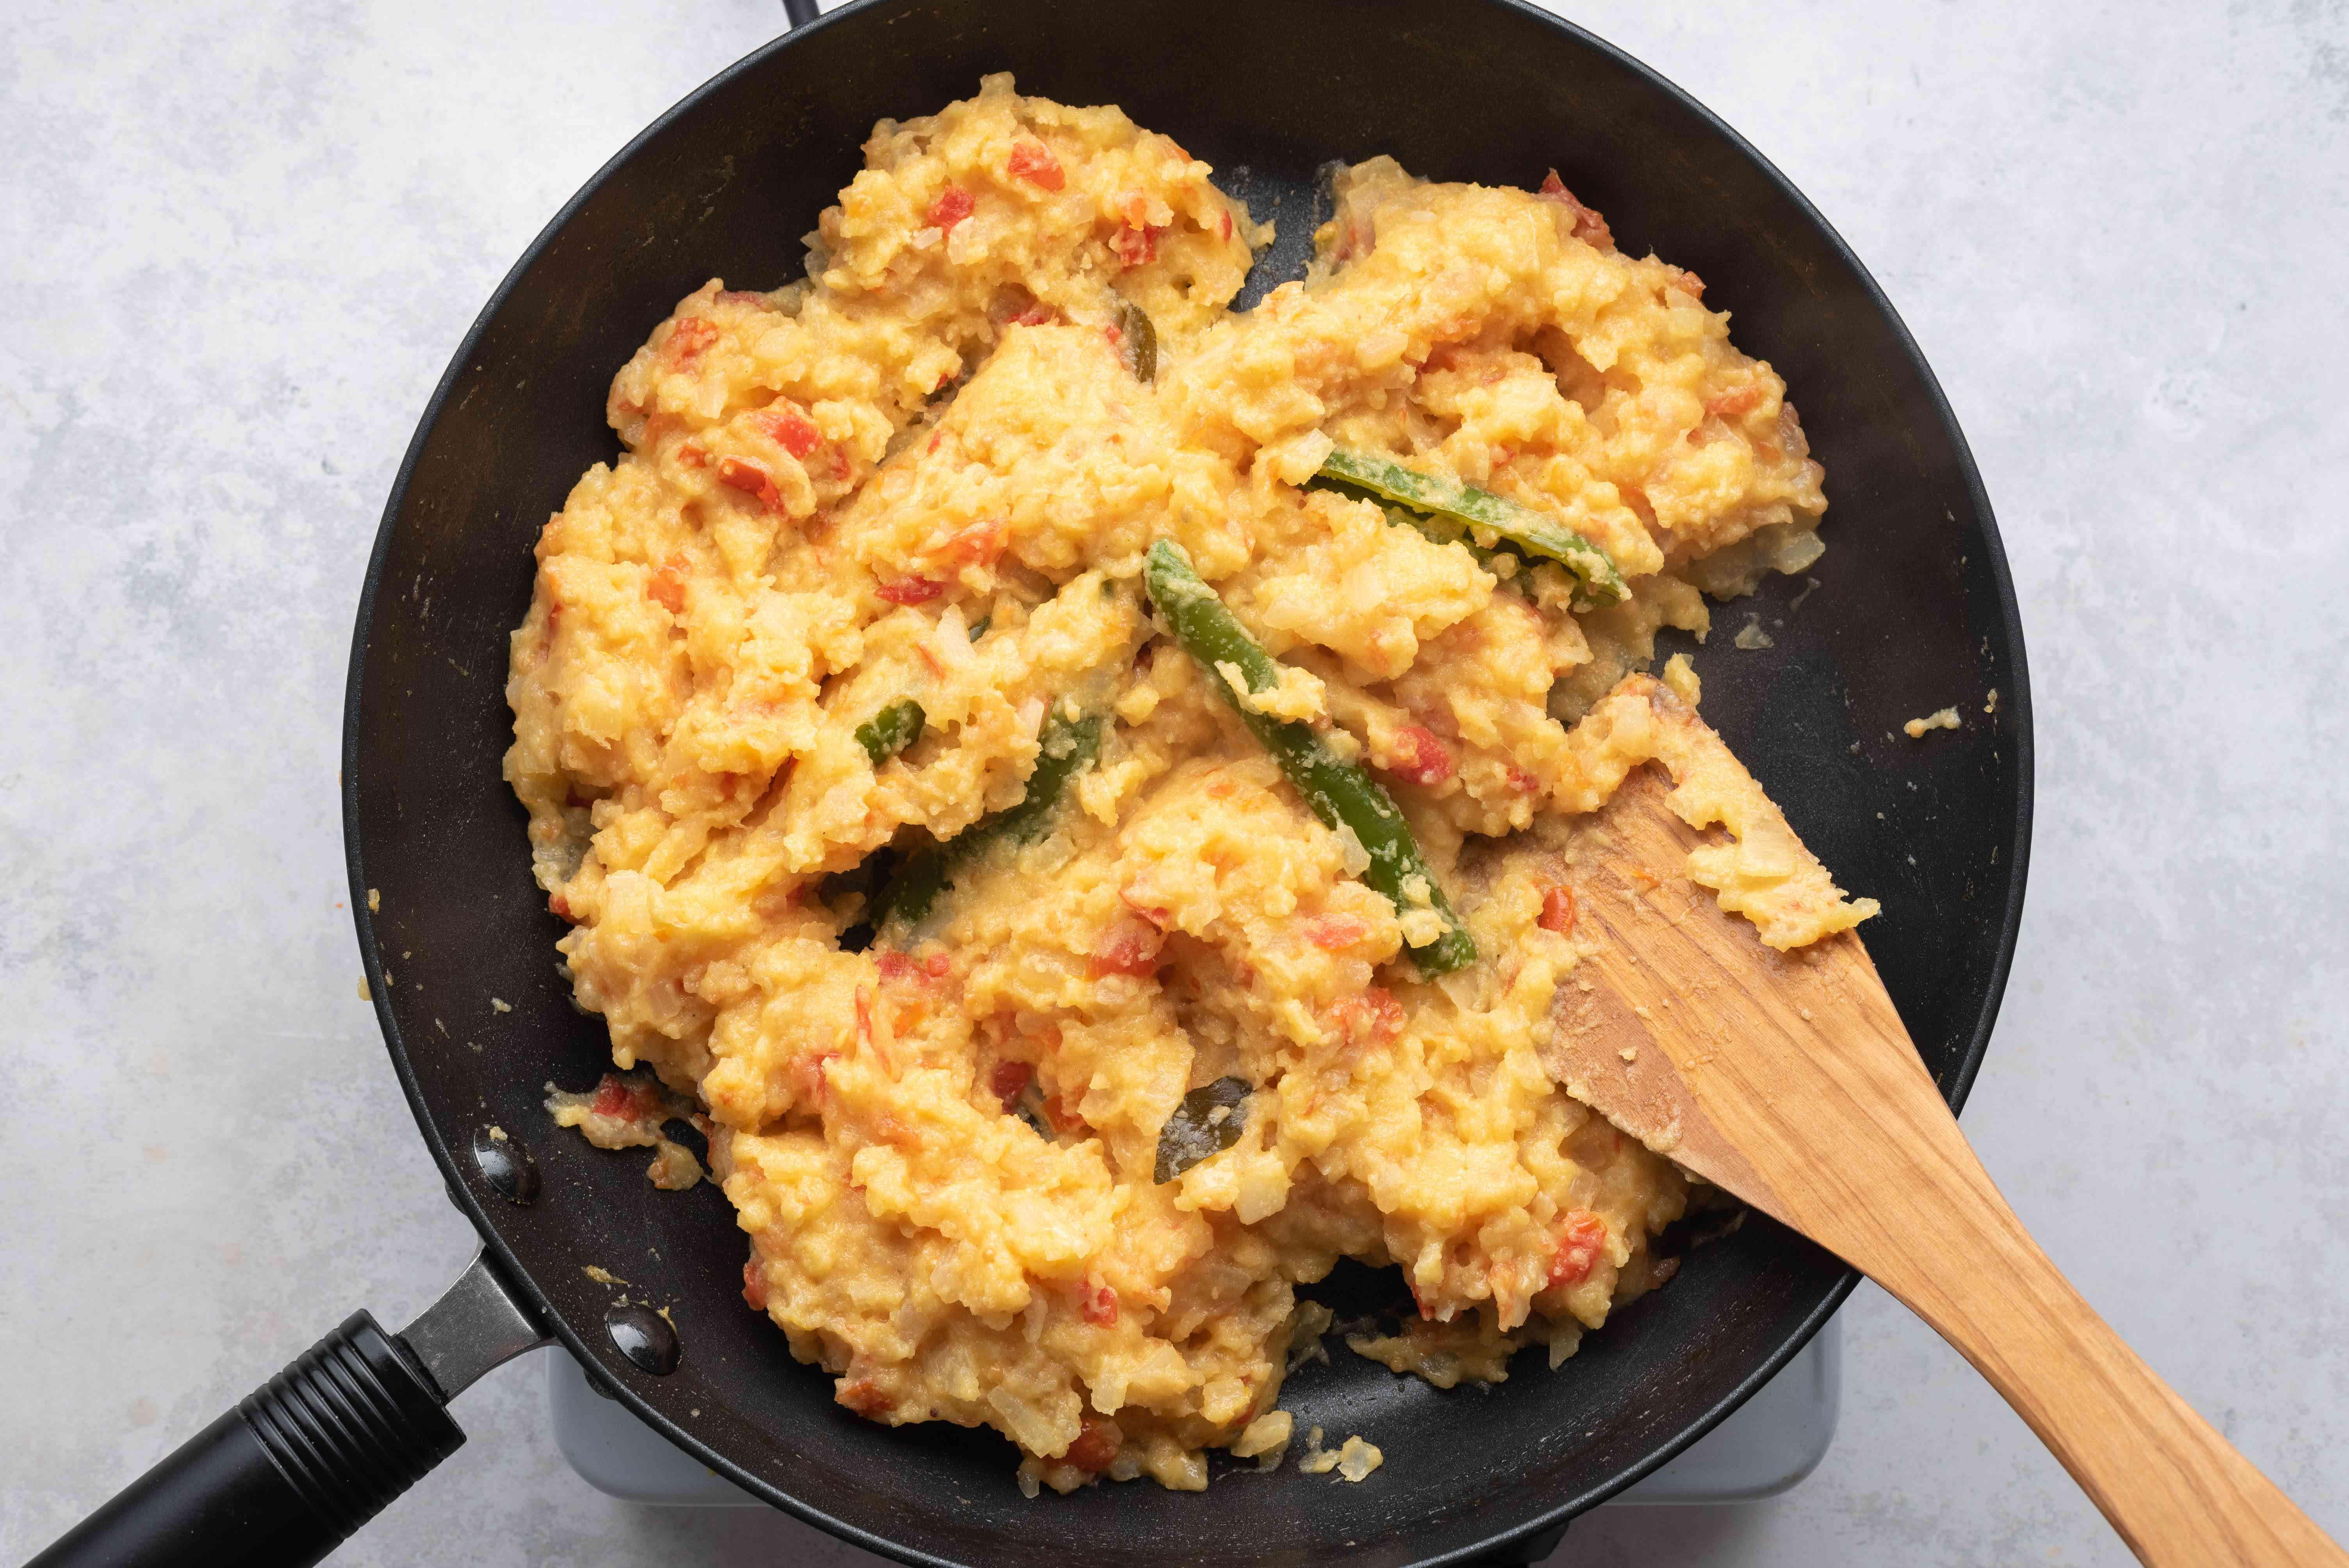 semolina mixture cooking in a pan